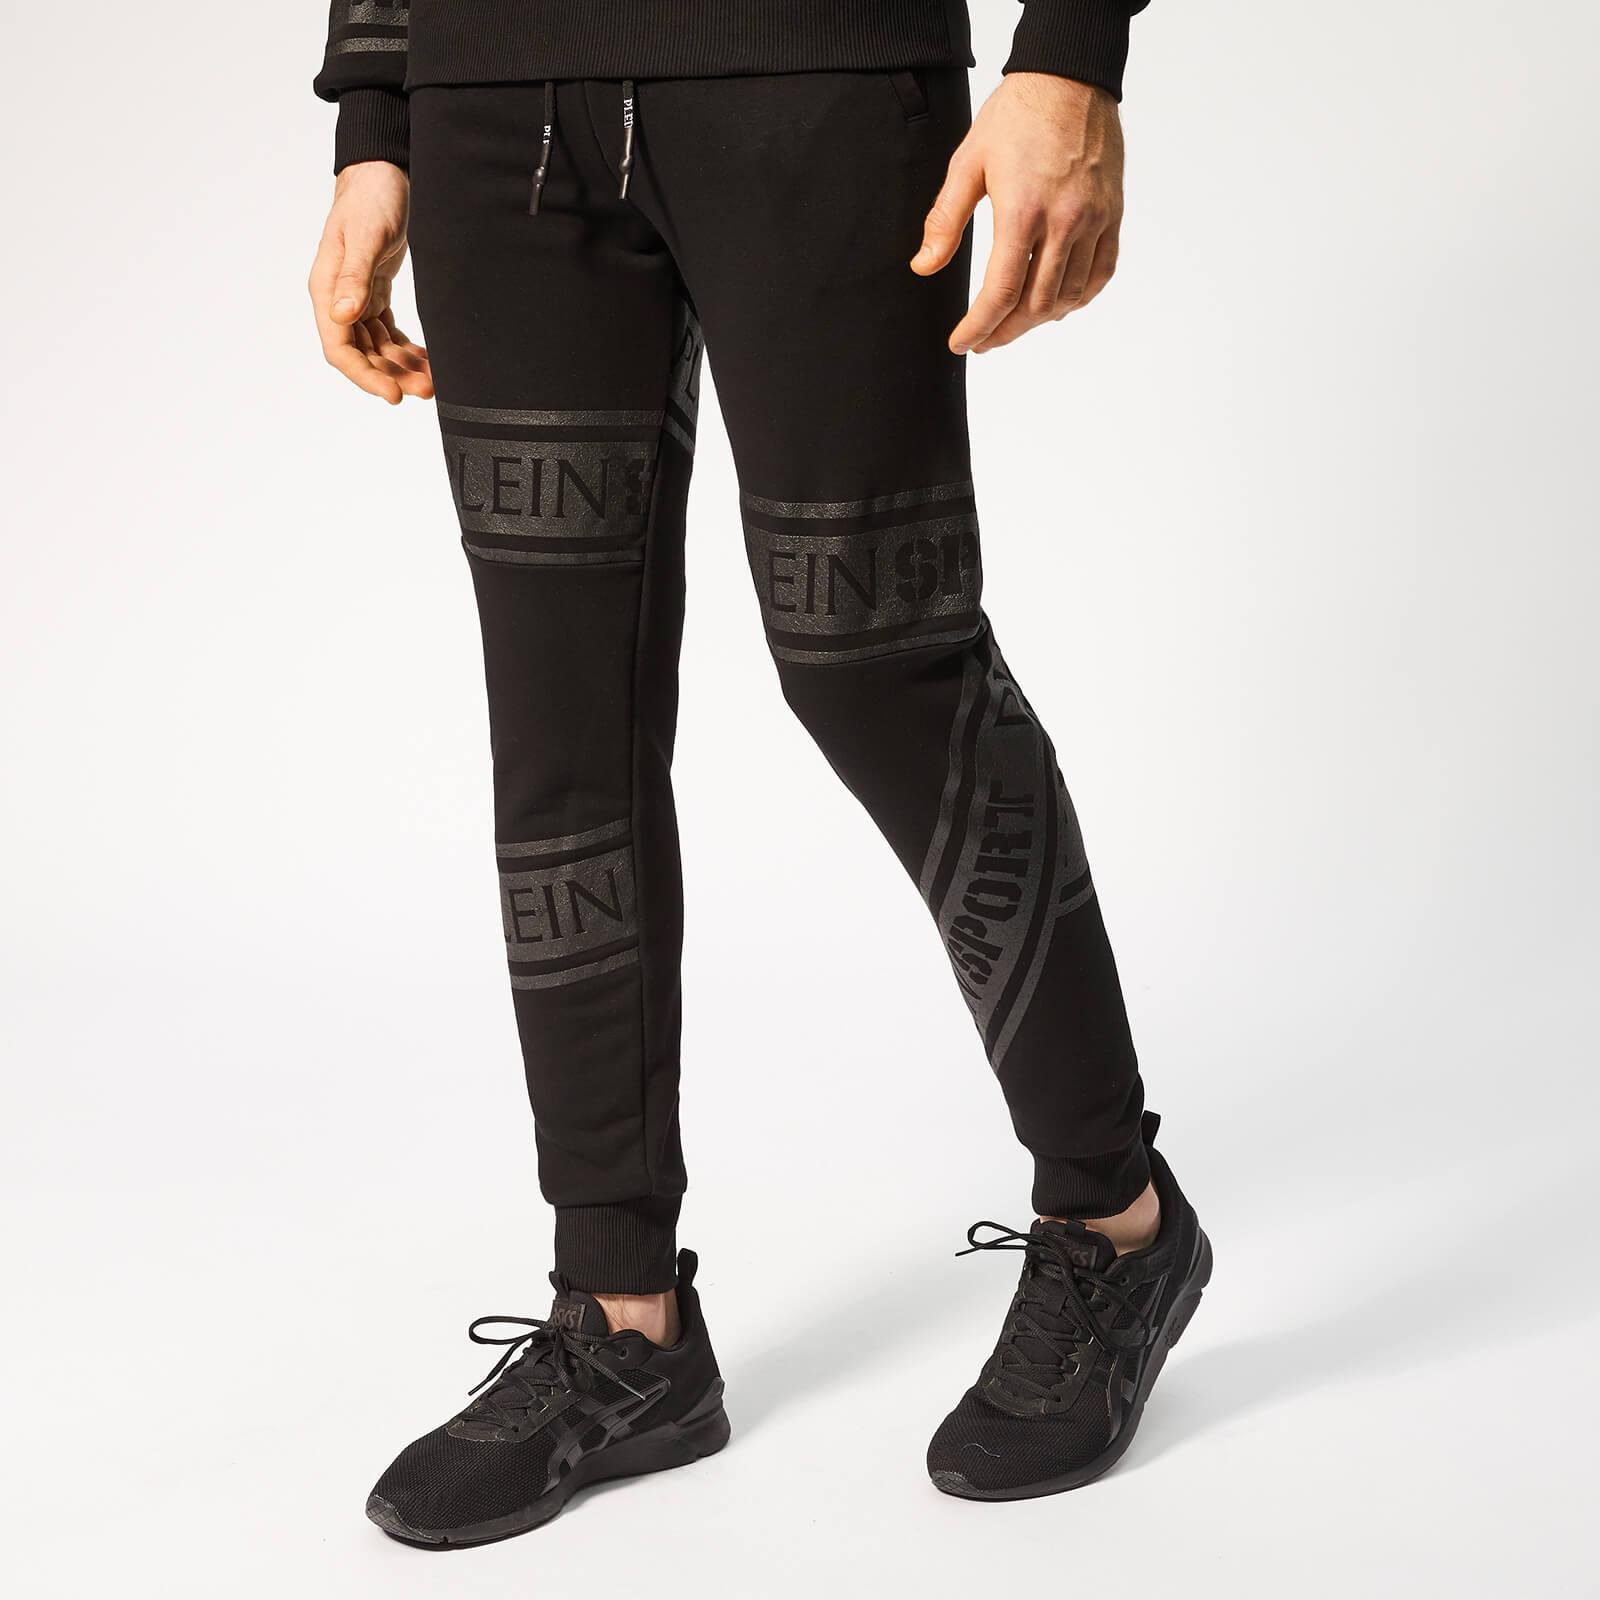 Plein Sport Men's Tape Stripes Jogging Trousers - Black - XL - Black